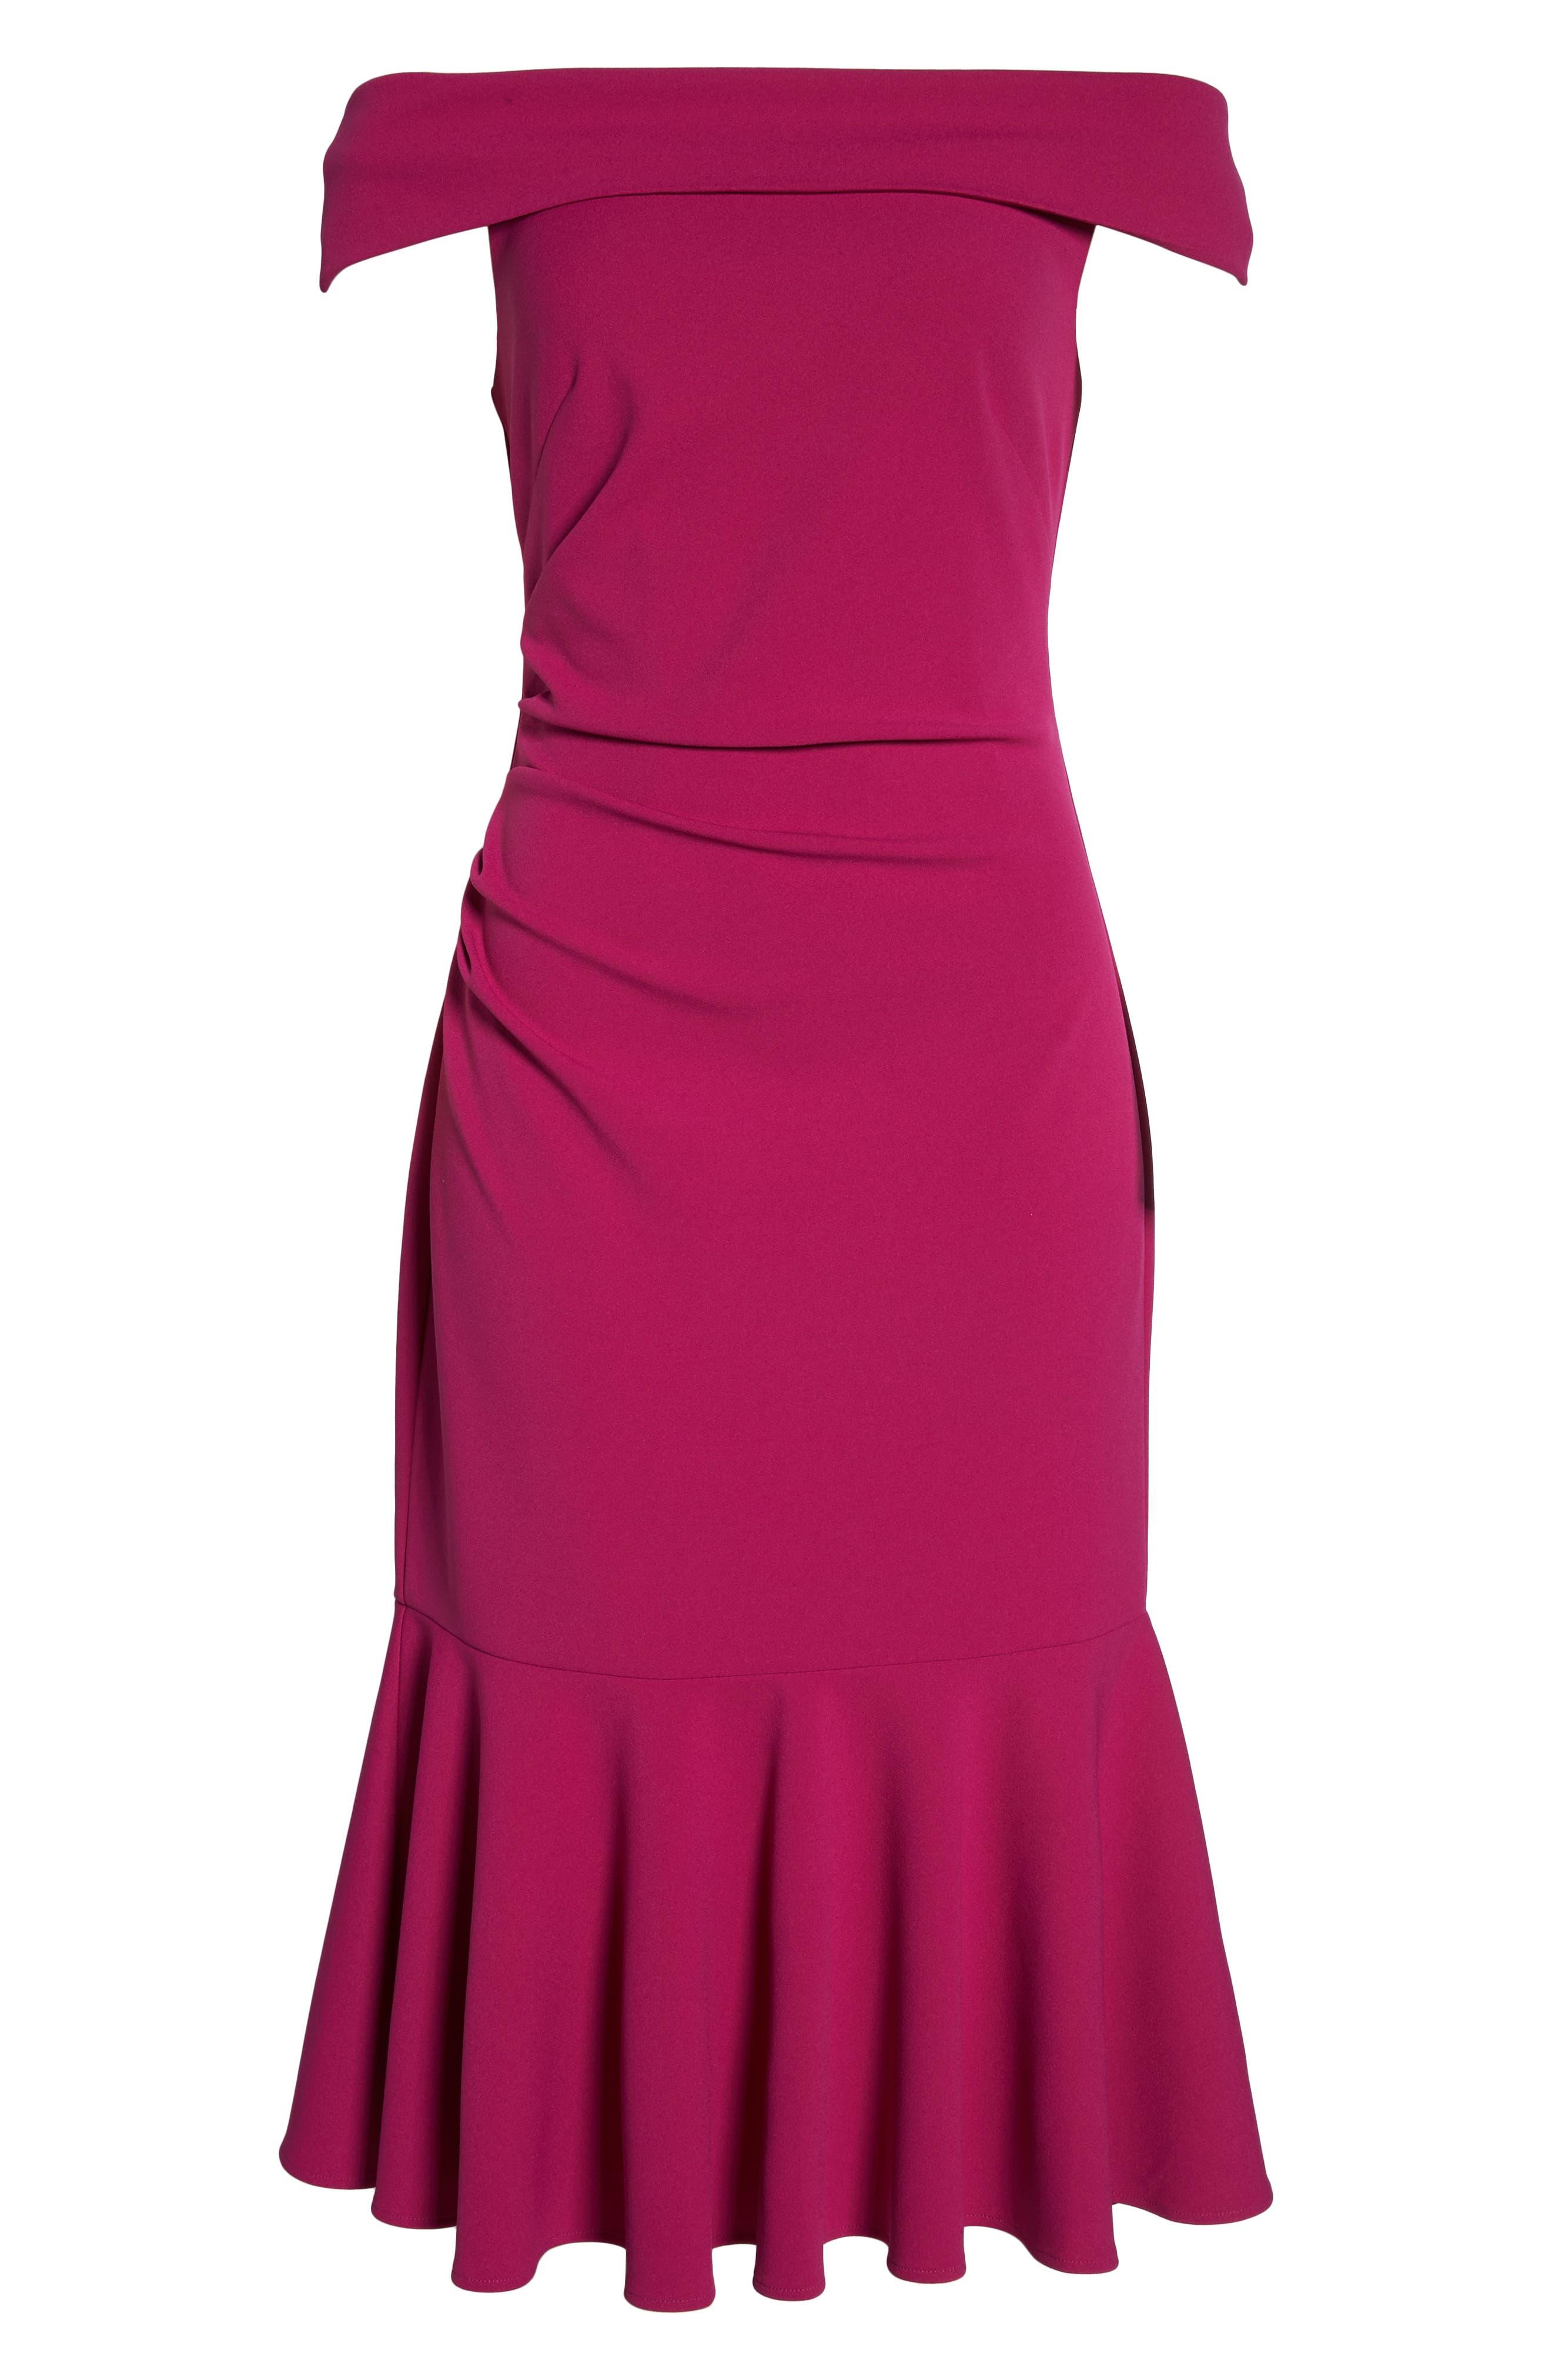 Off the Shoulder Midi Dress,                             Alternate thumbnail 7, color,                             Raspberry